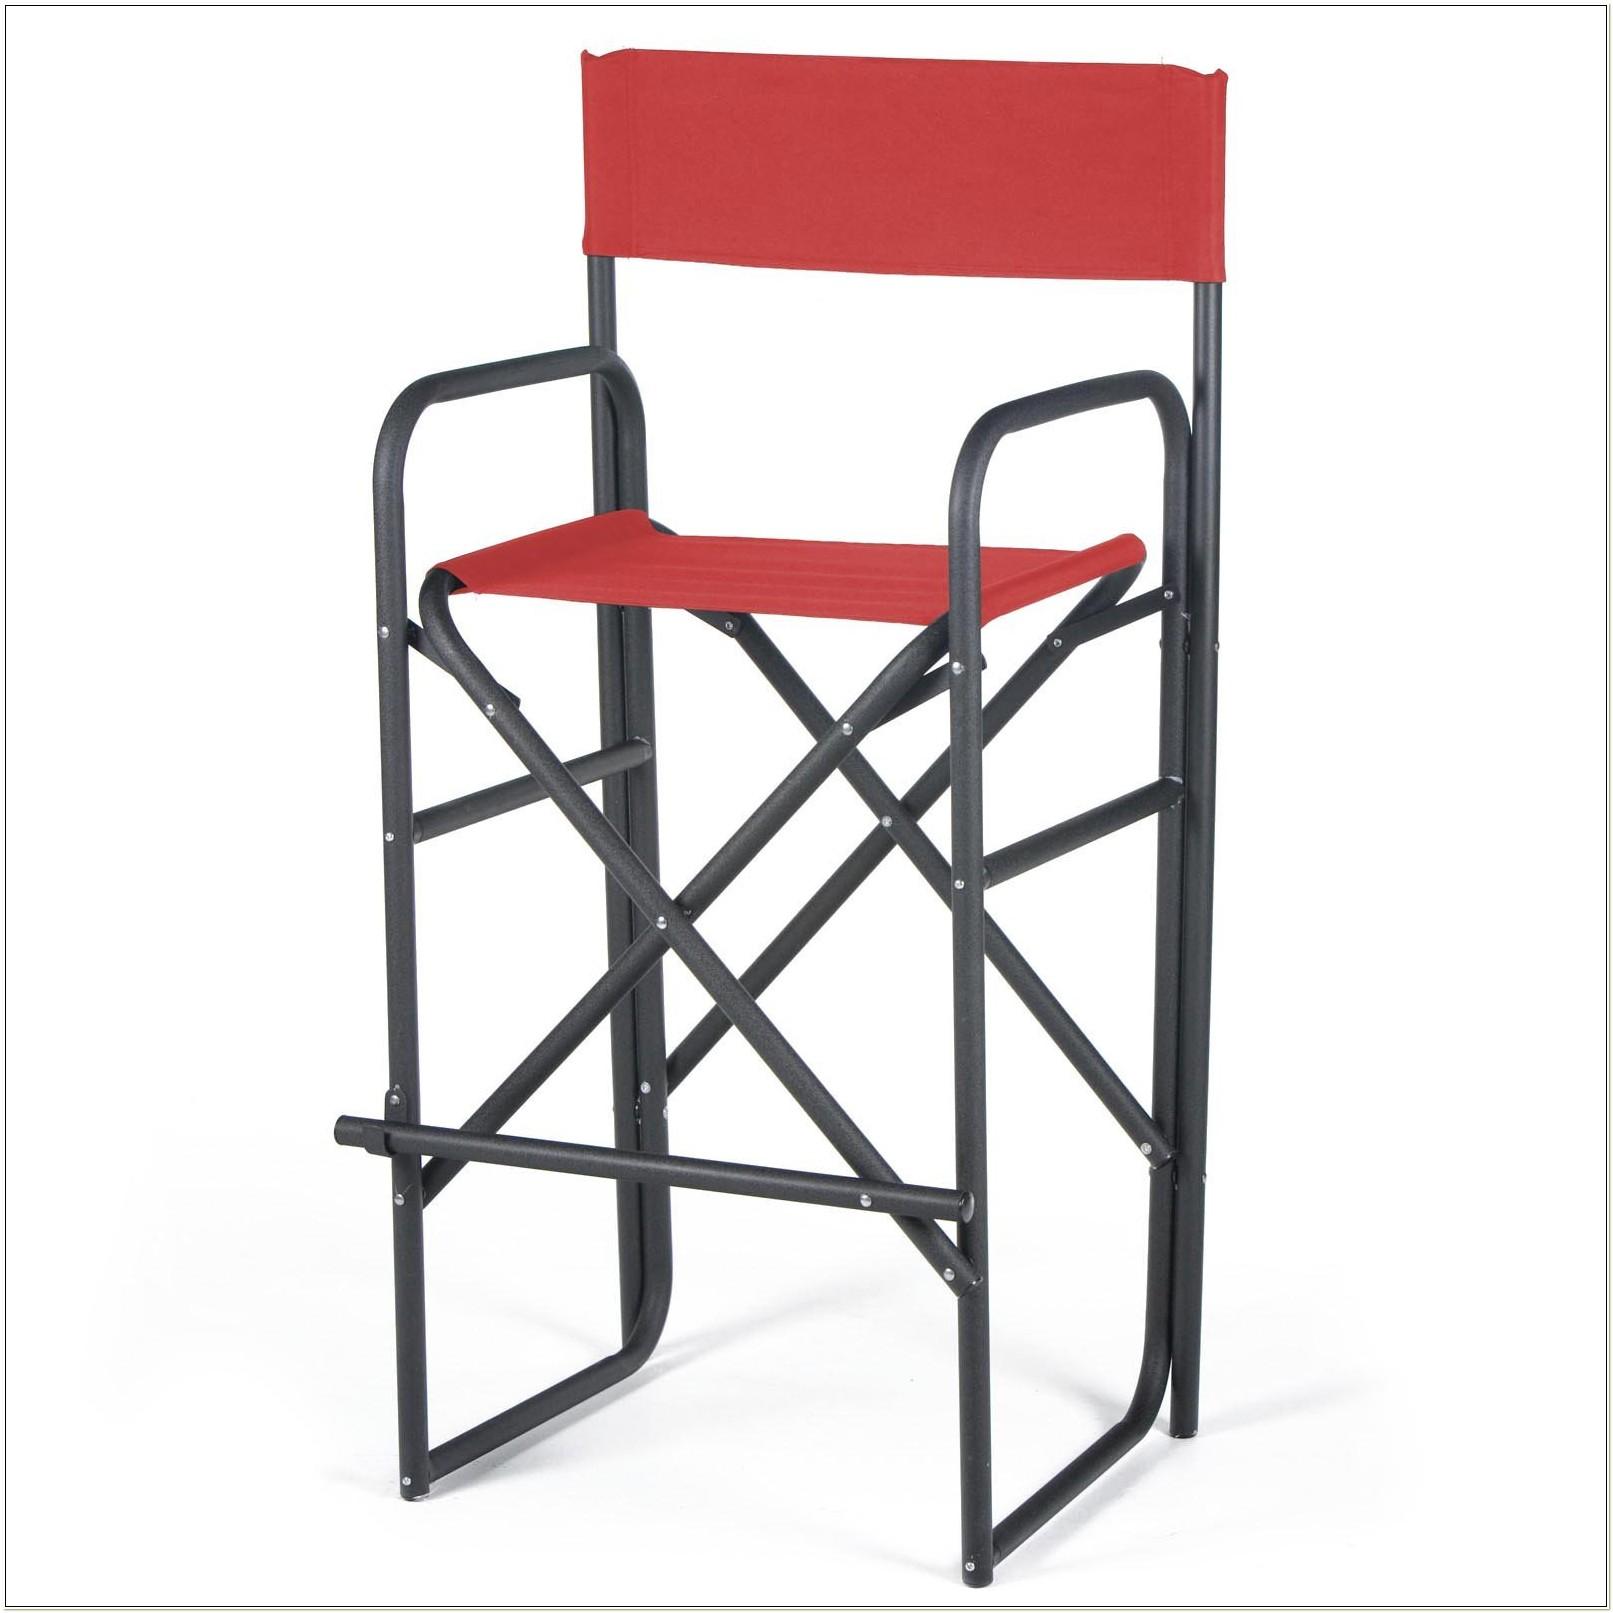 Outdoor Directors Chairs Bar Height